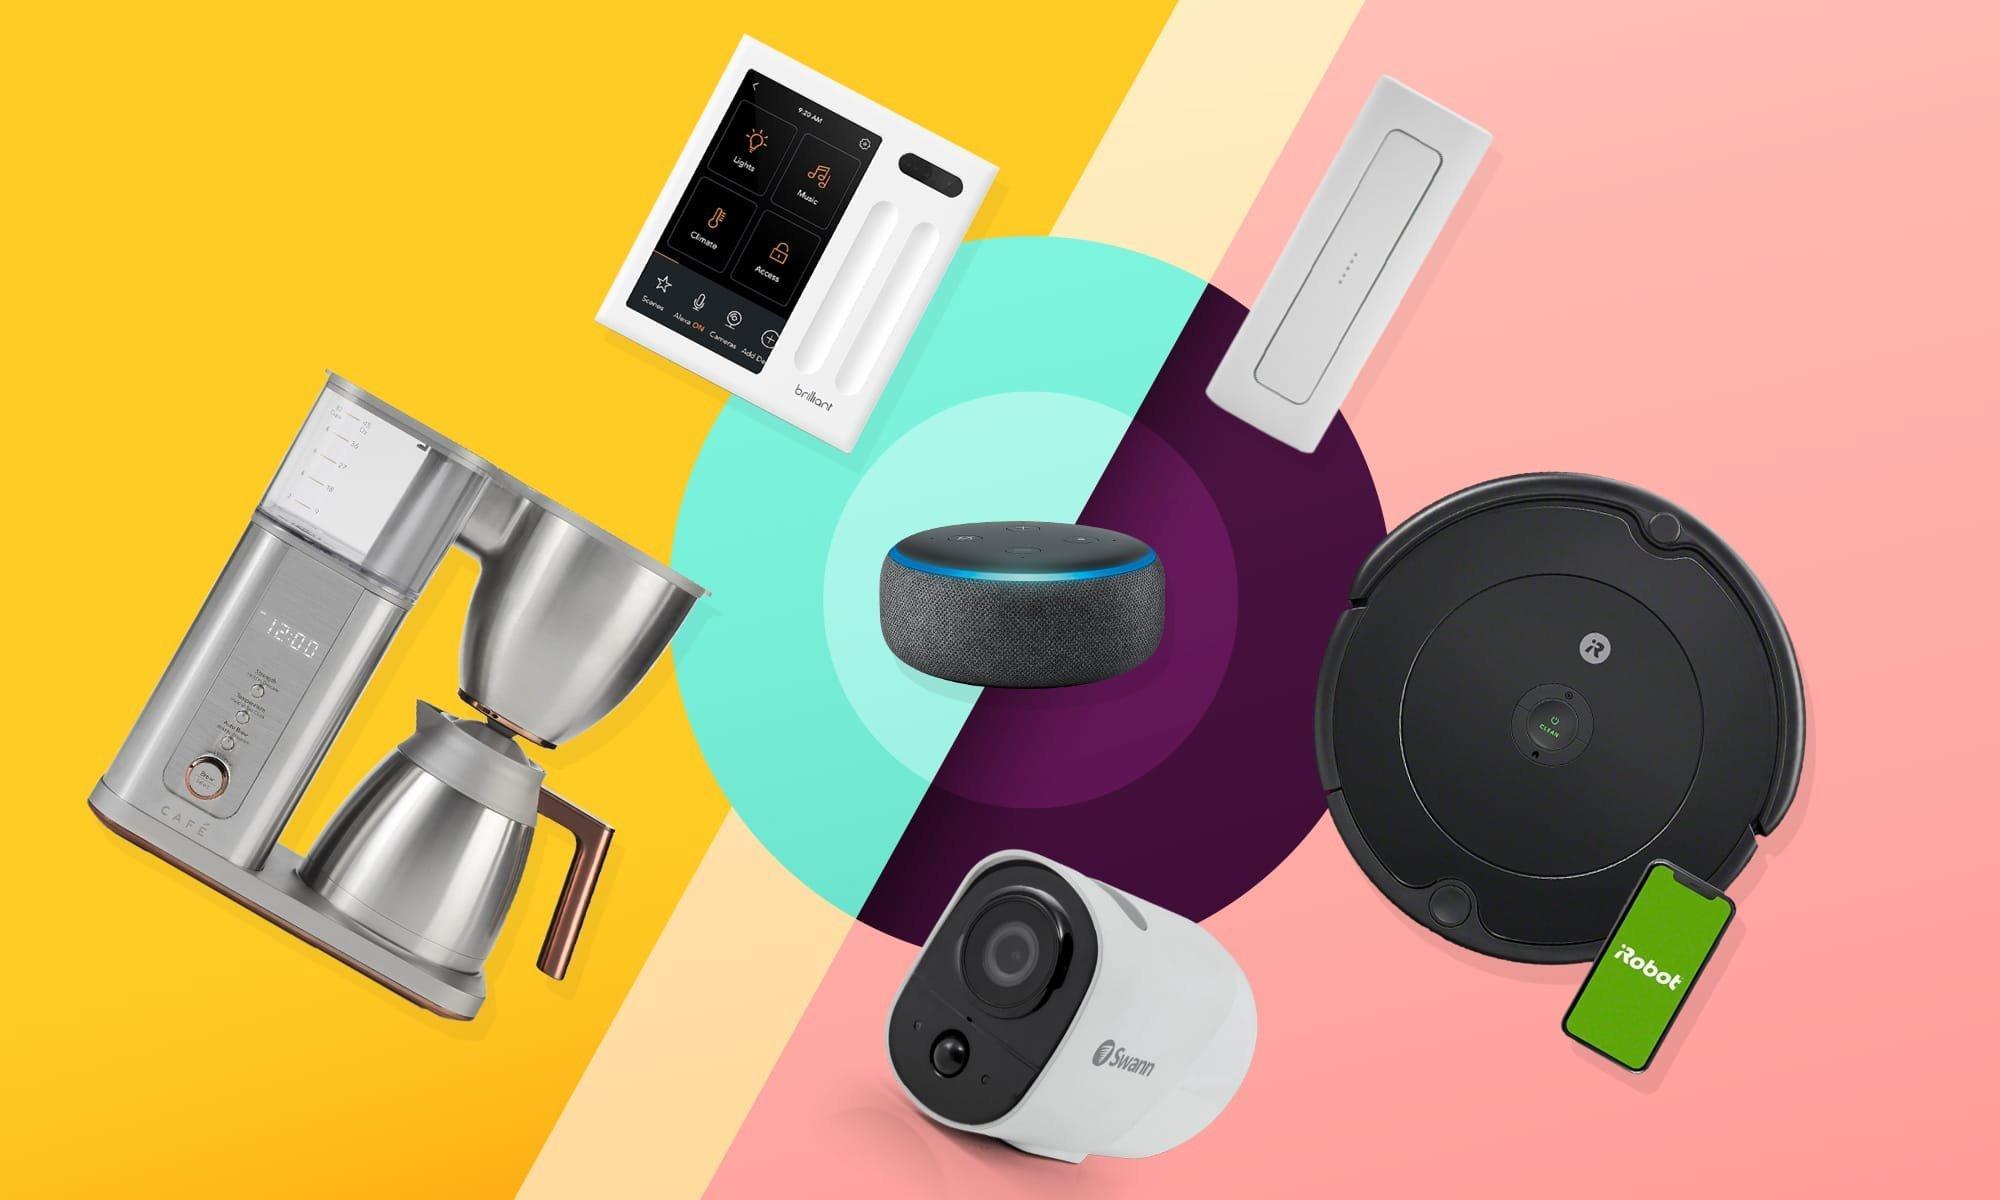 The best Alexa gadgets to buy in 2021